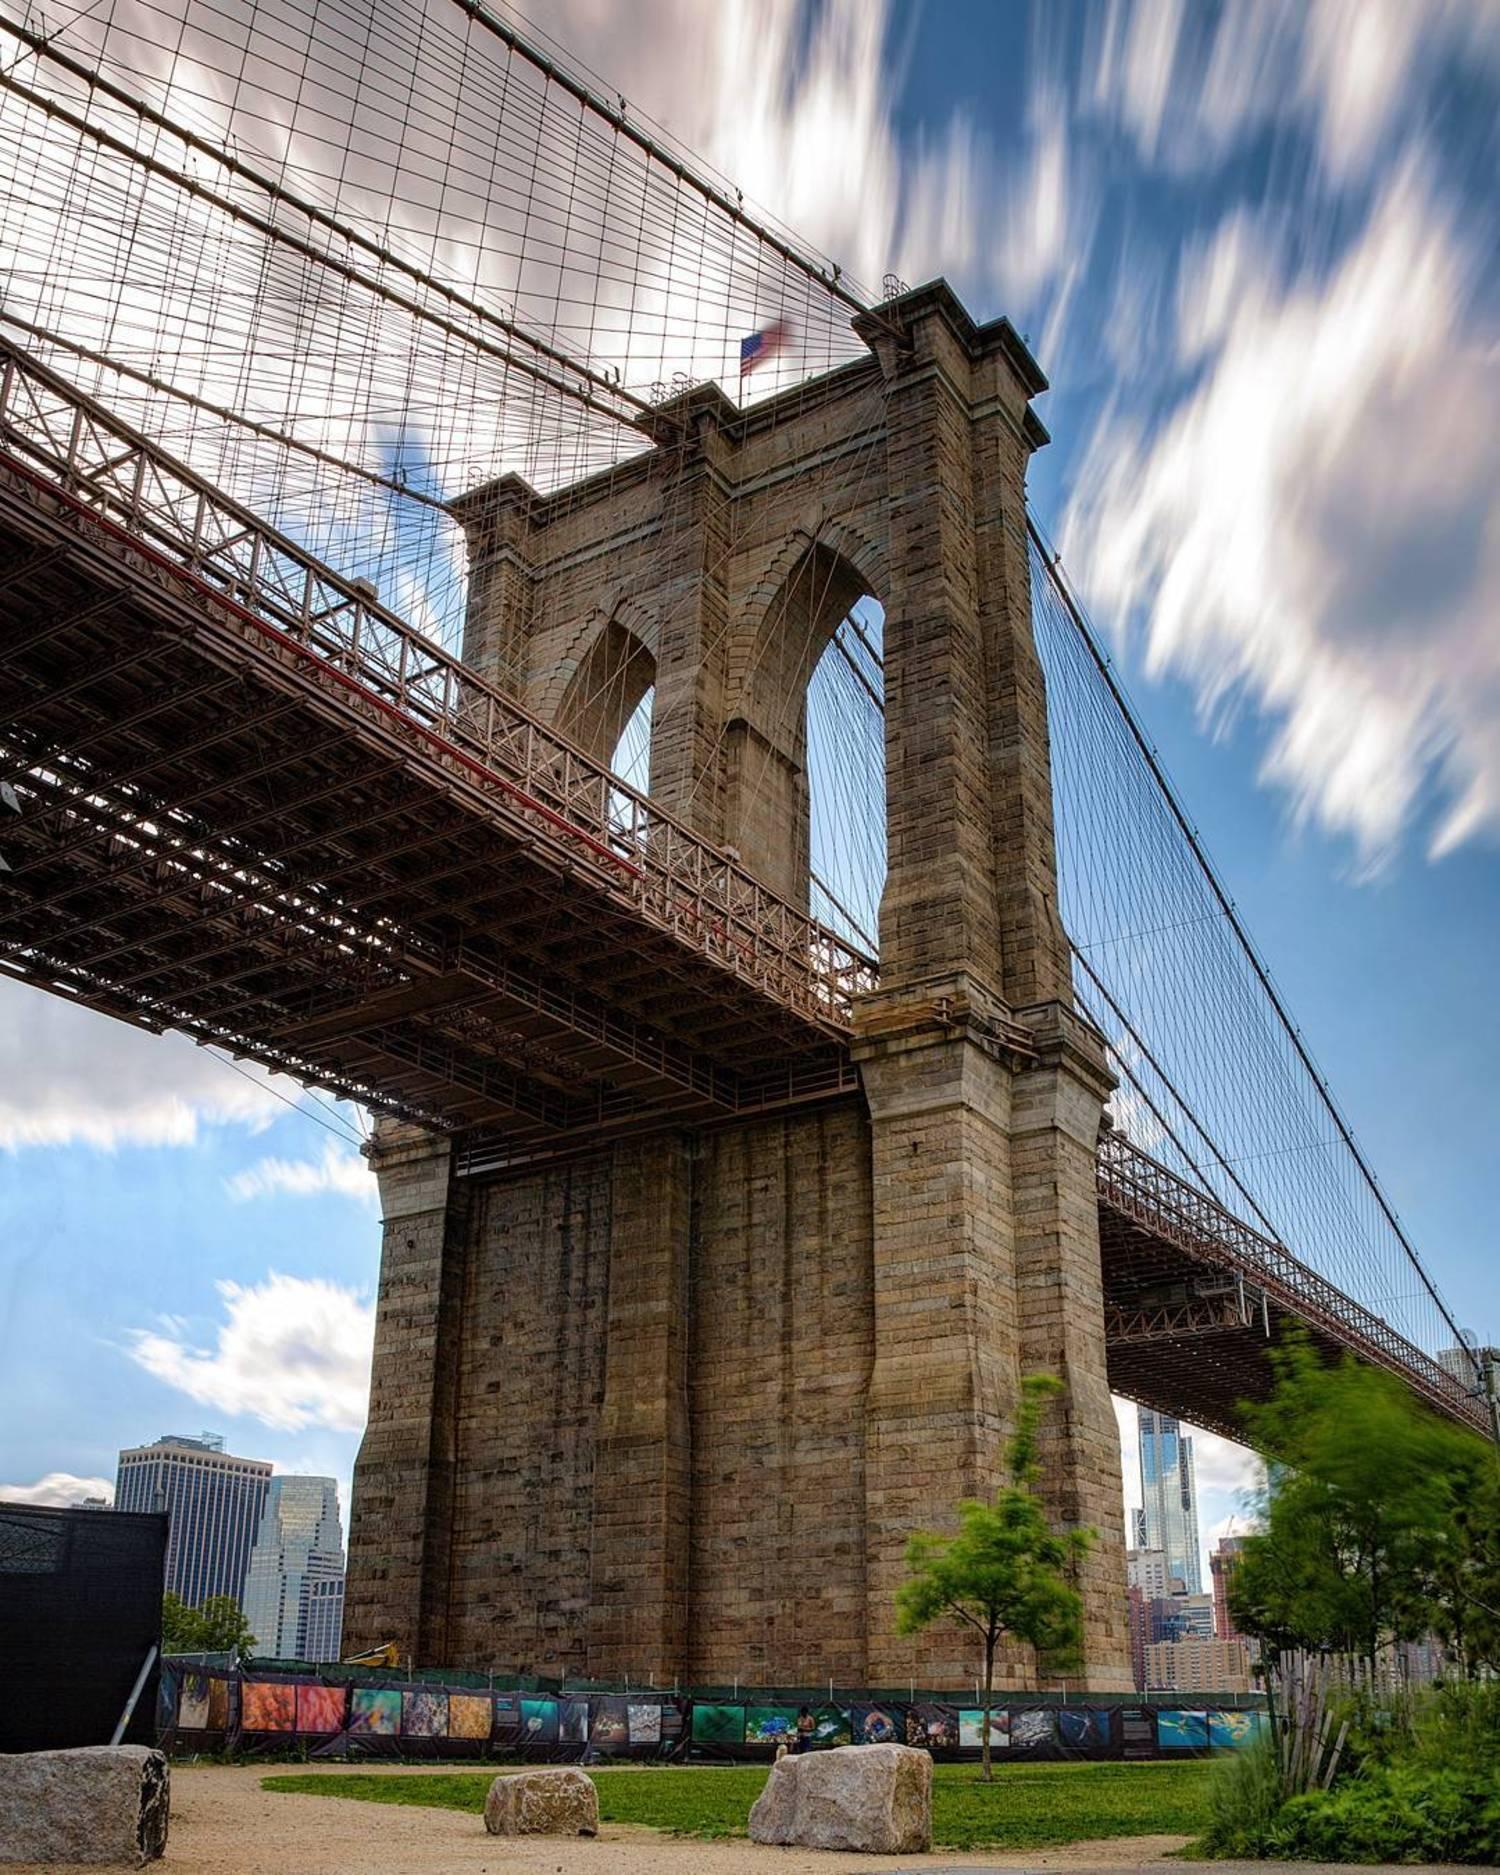 """Brooklyn Views! The Brooklyn Bridge as seen on a beautiful spring day!"""